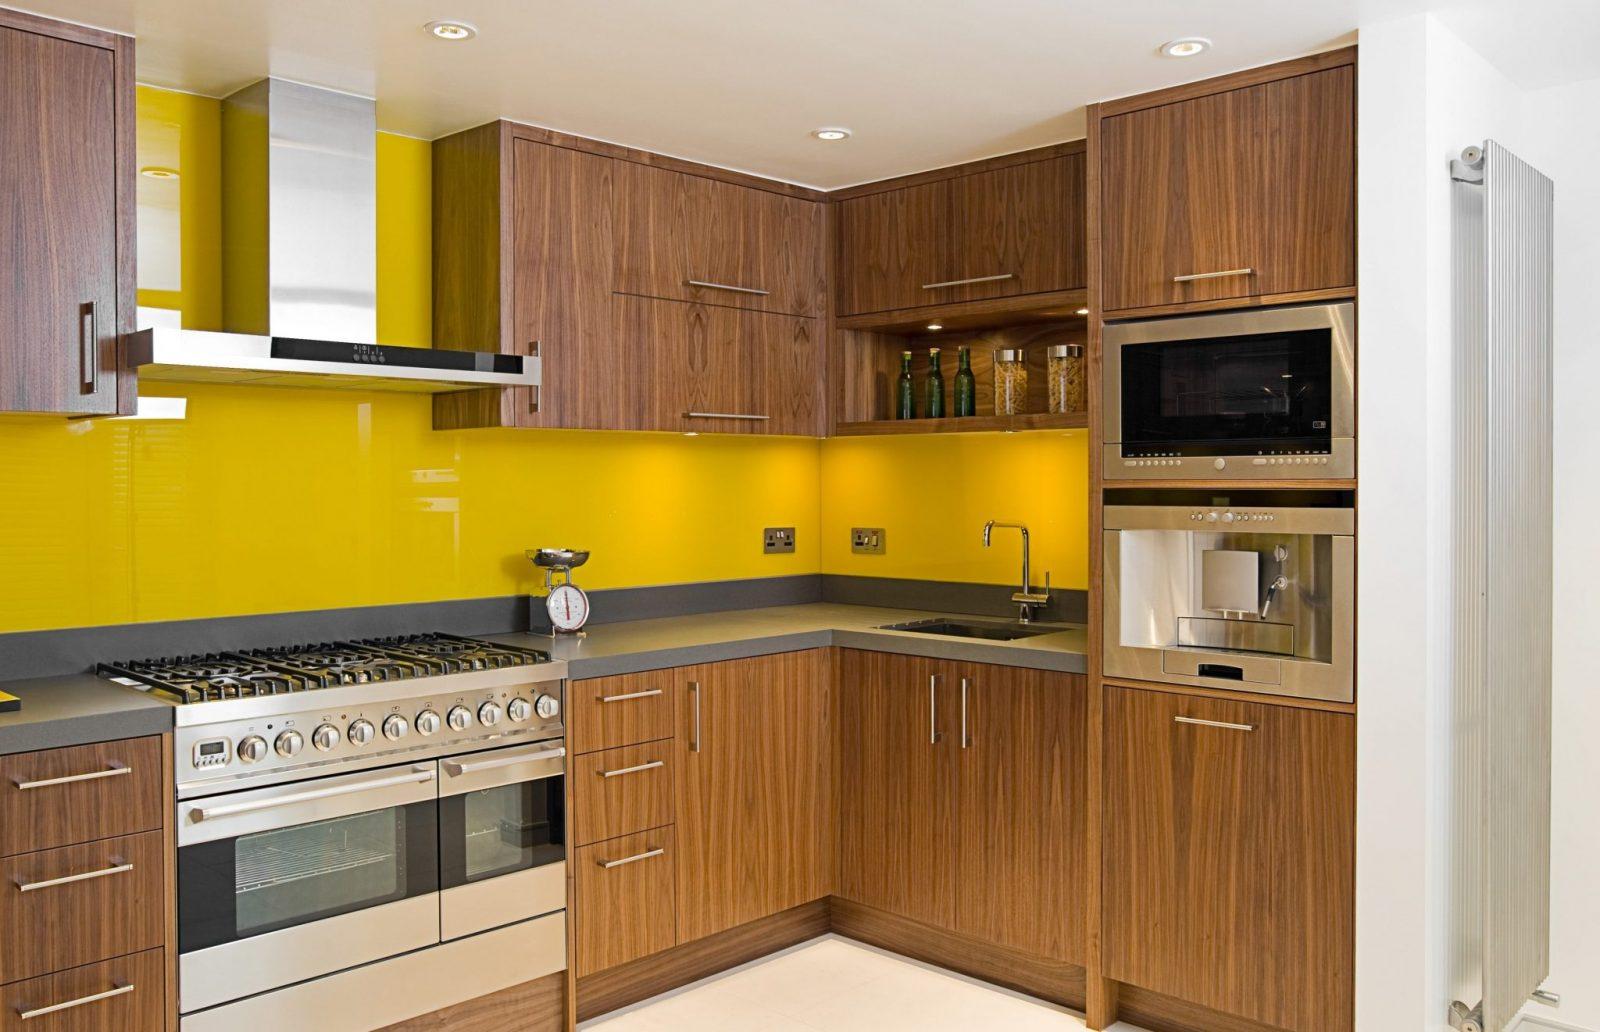 Glass splashbacks in kitchens - Practical